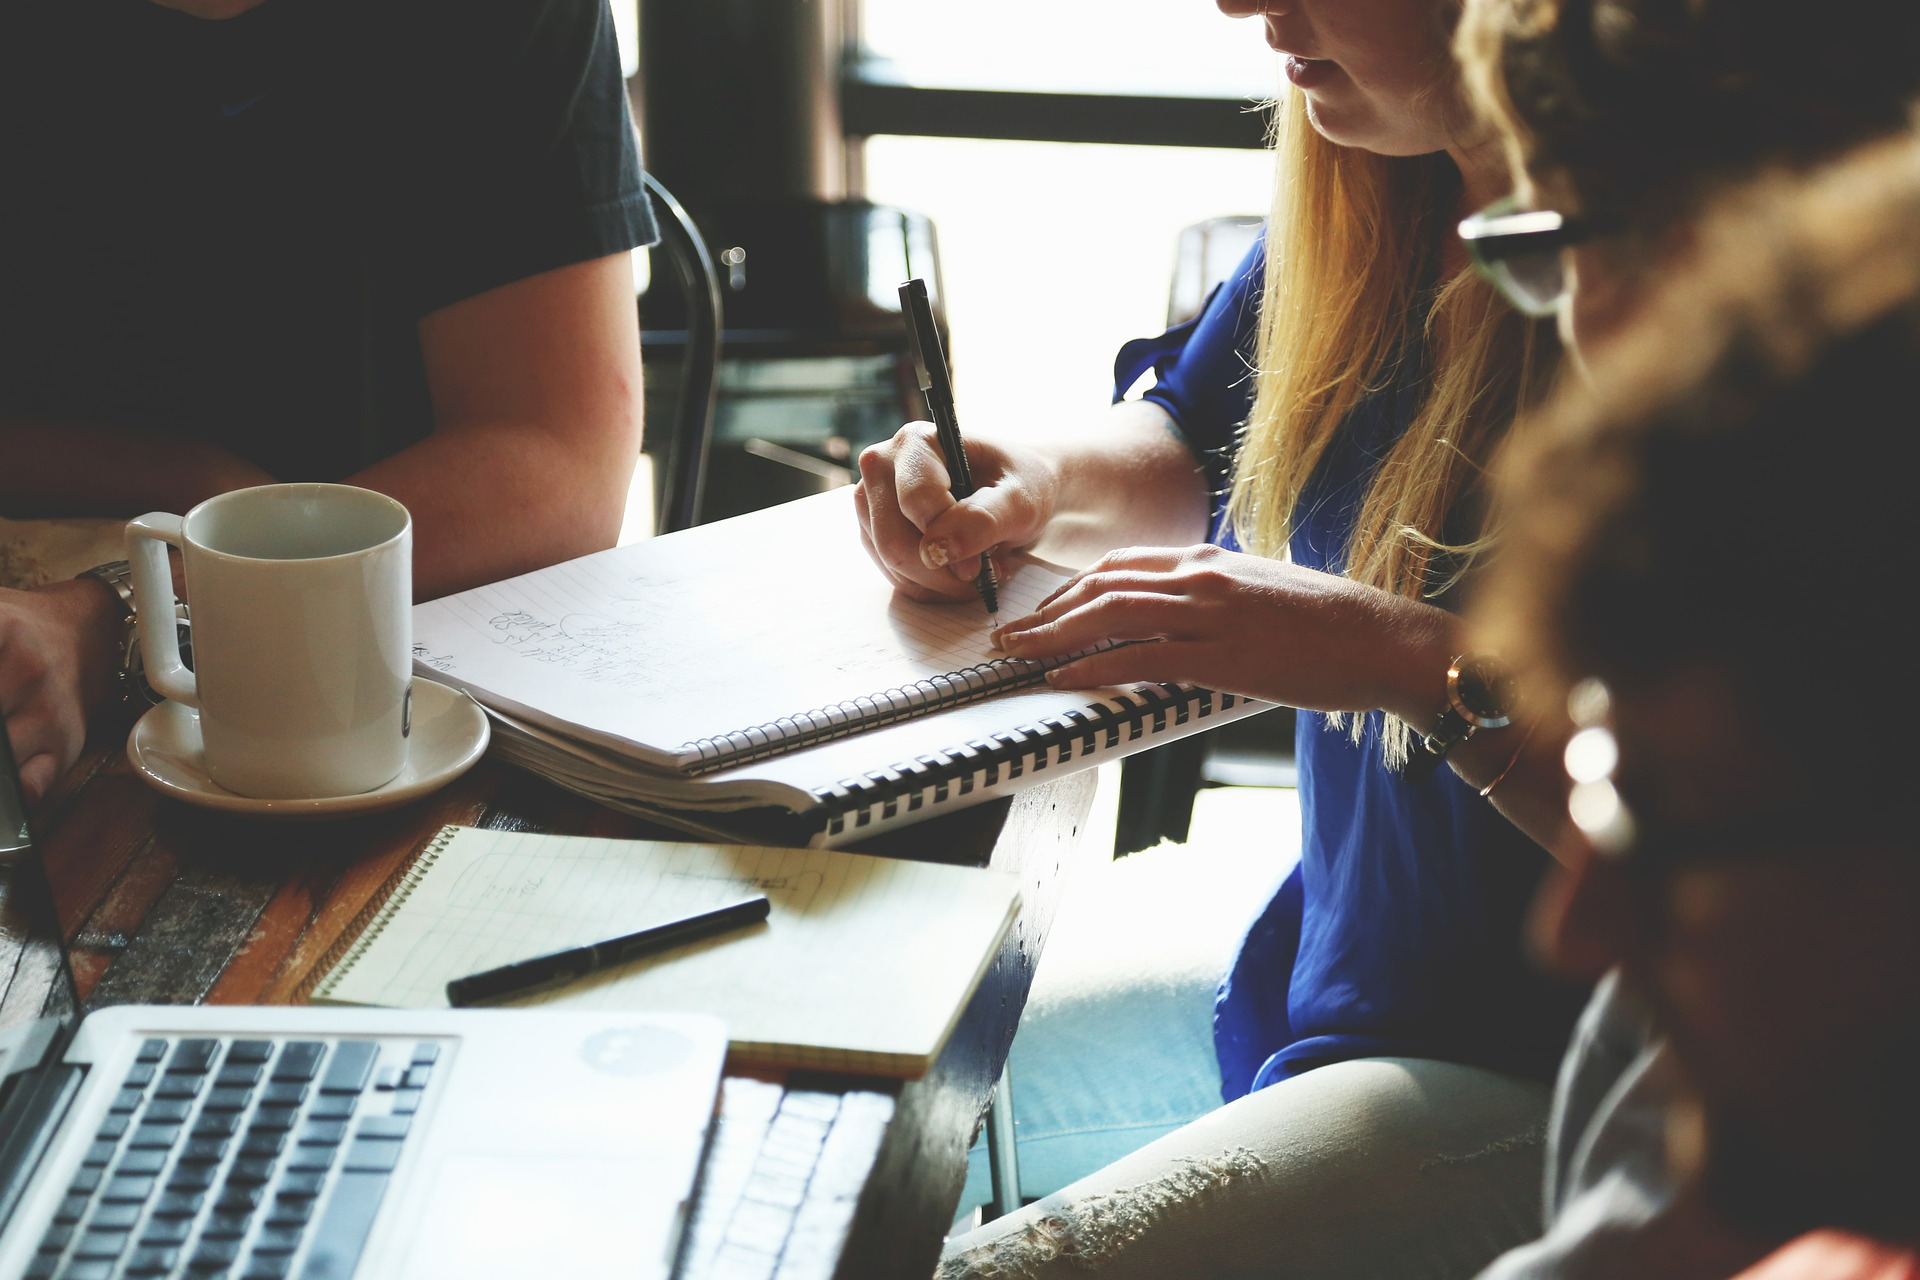 team-behavior-kristin-arnold-blog